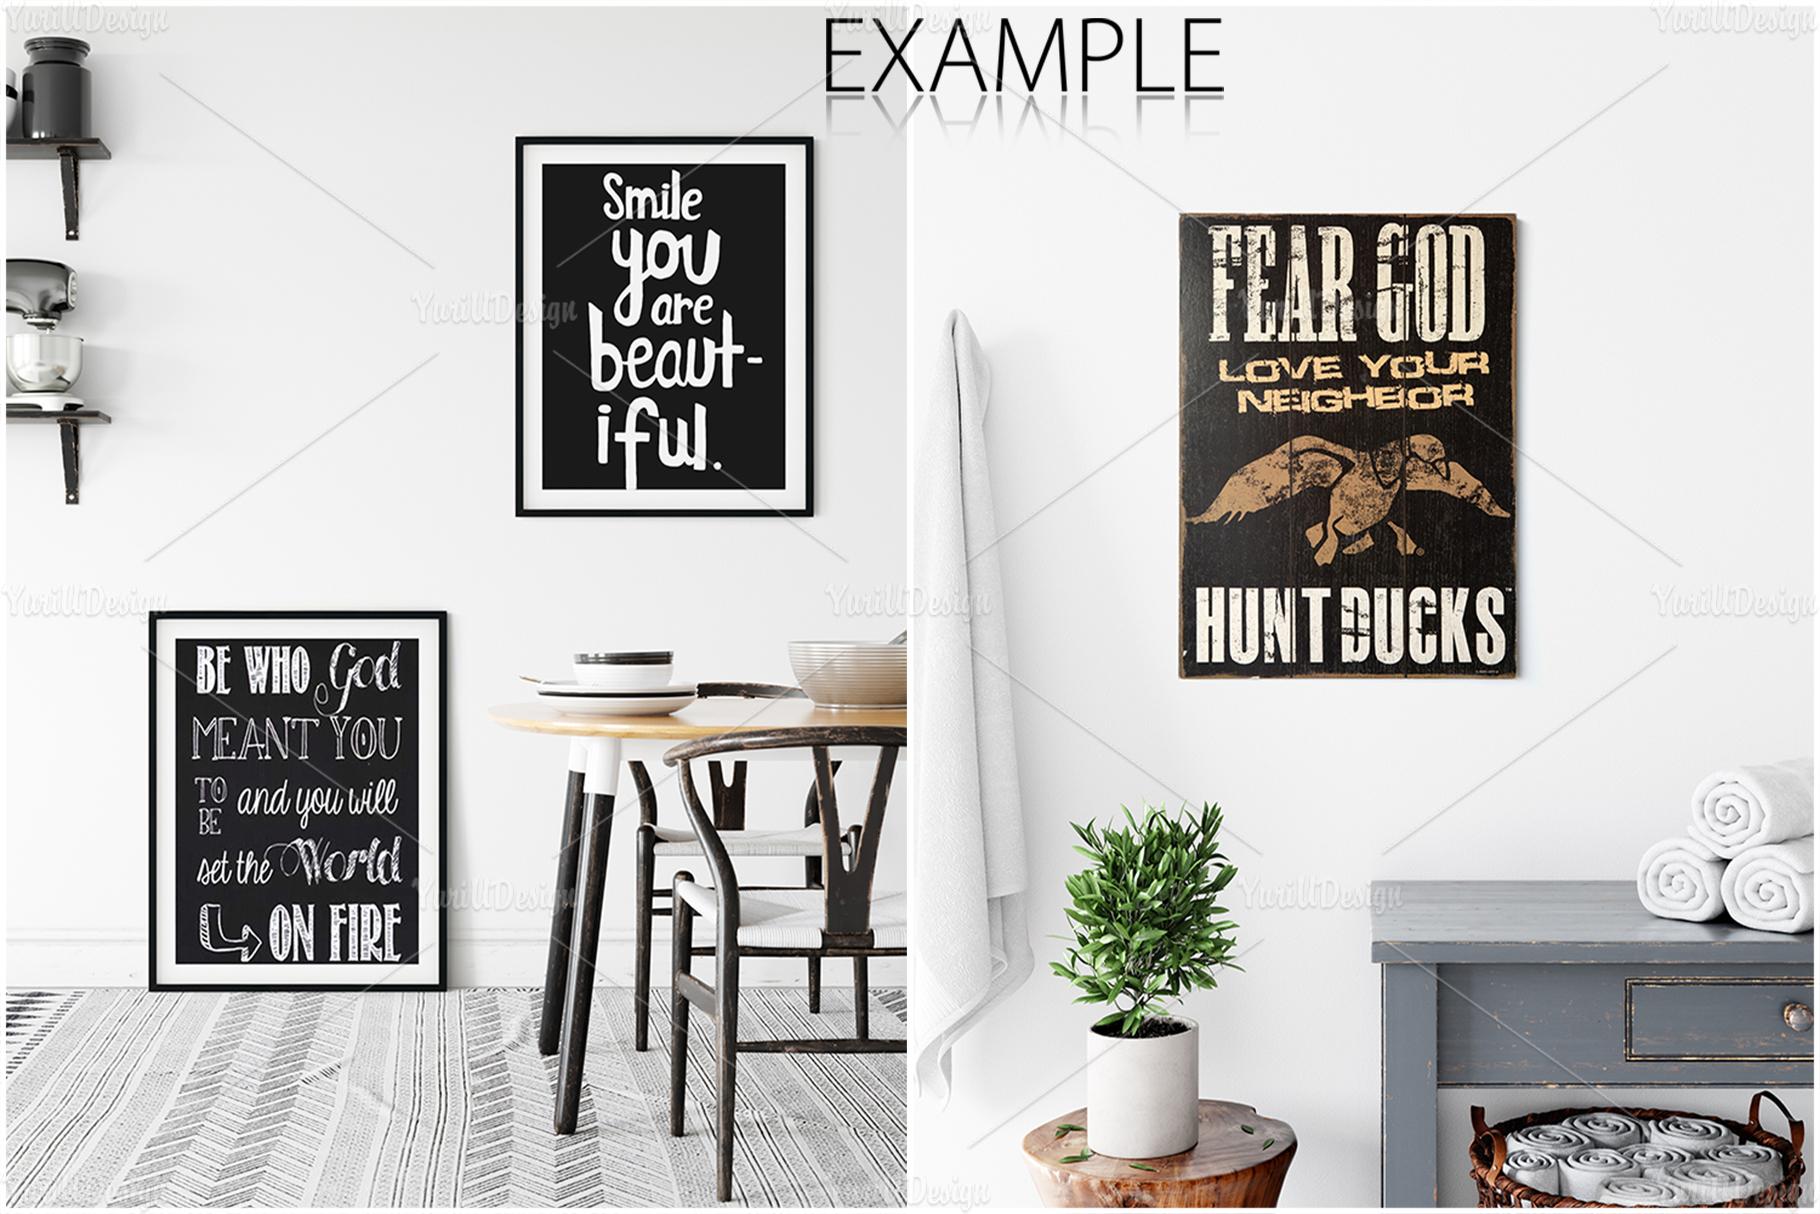 Scandinavian Interior Frames & Walls Mockup Bundle - 3 example image 18